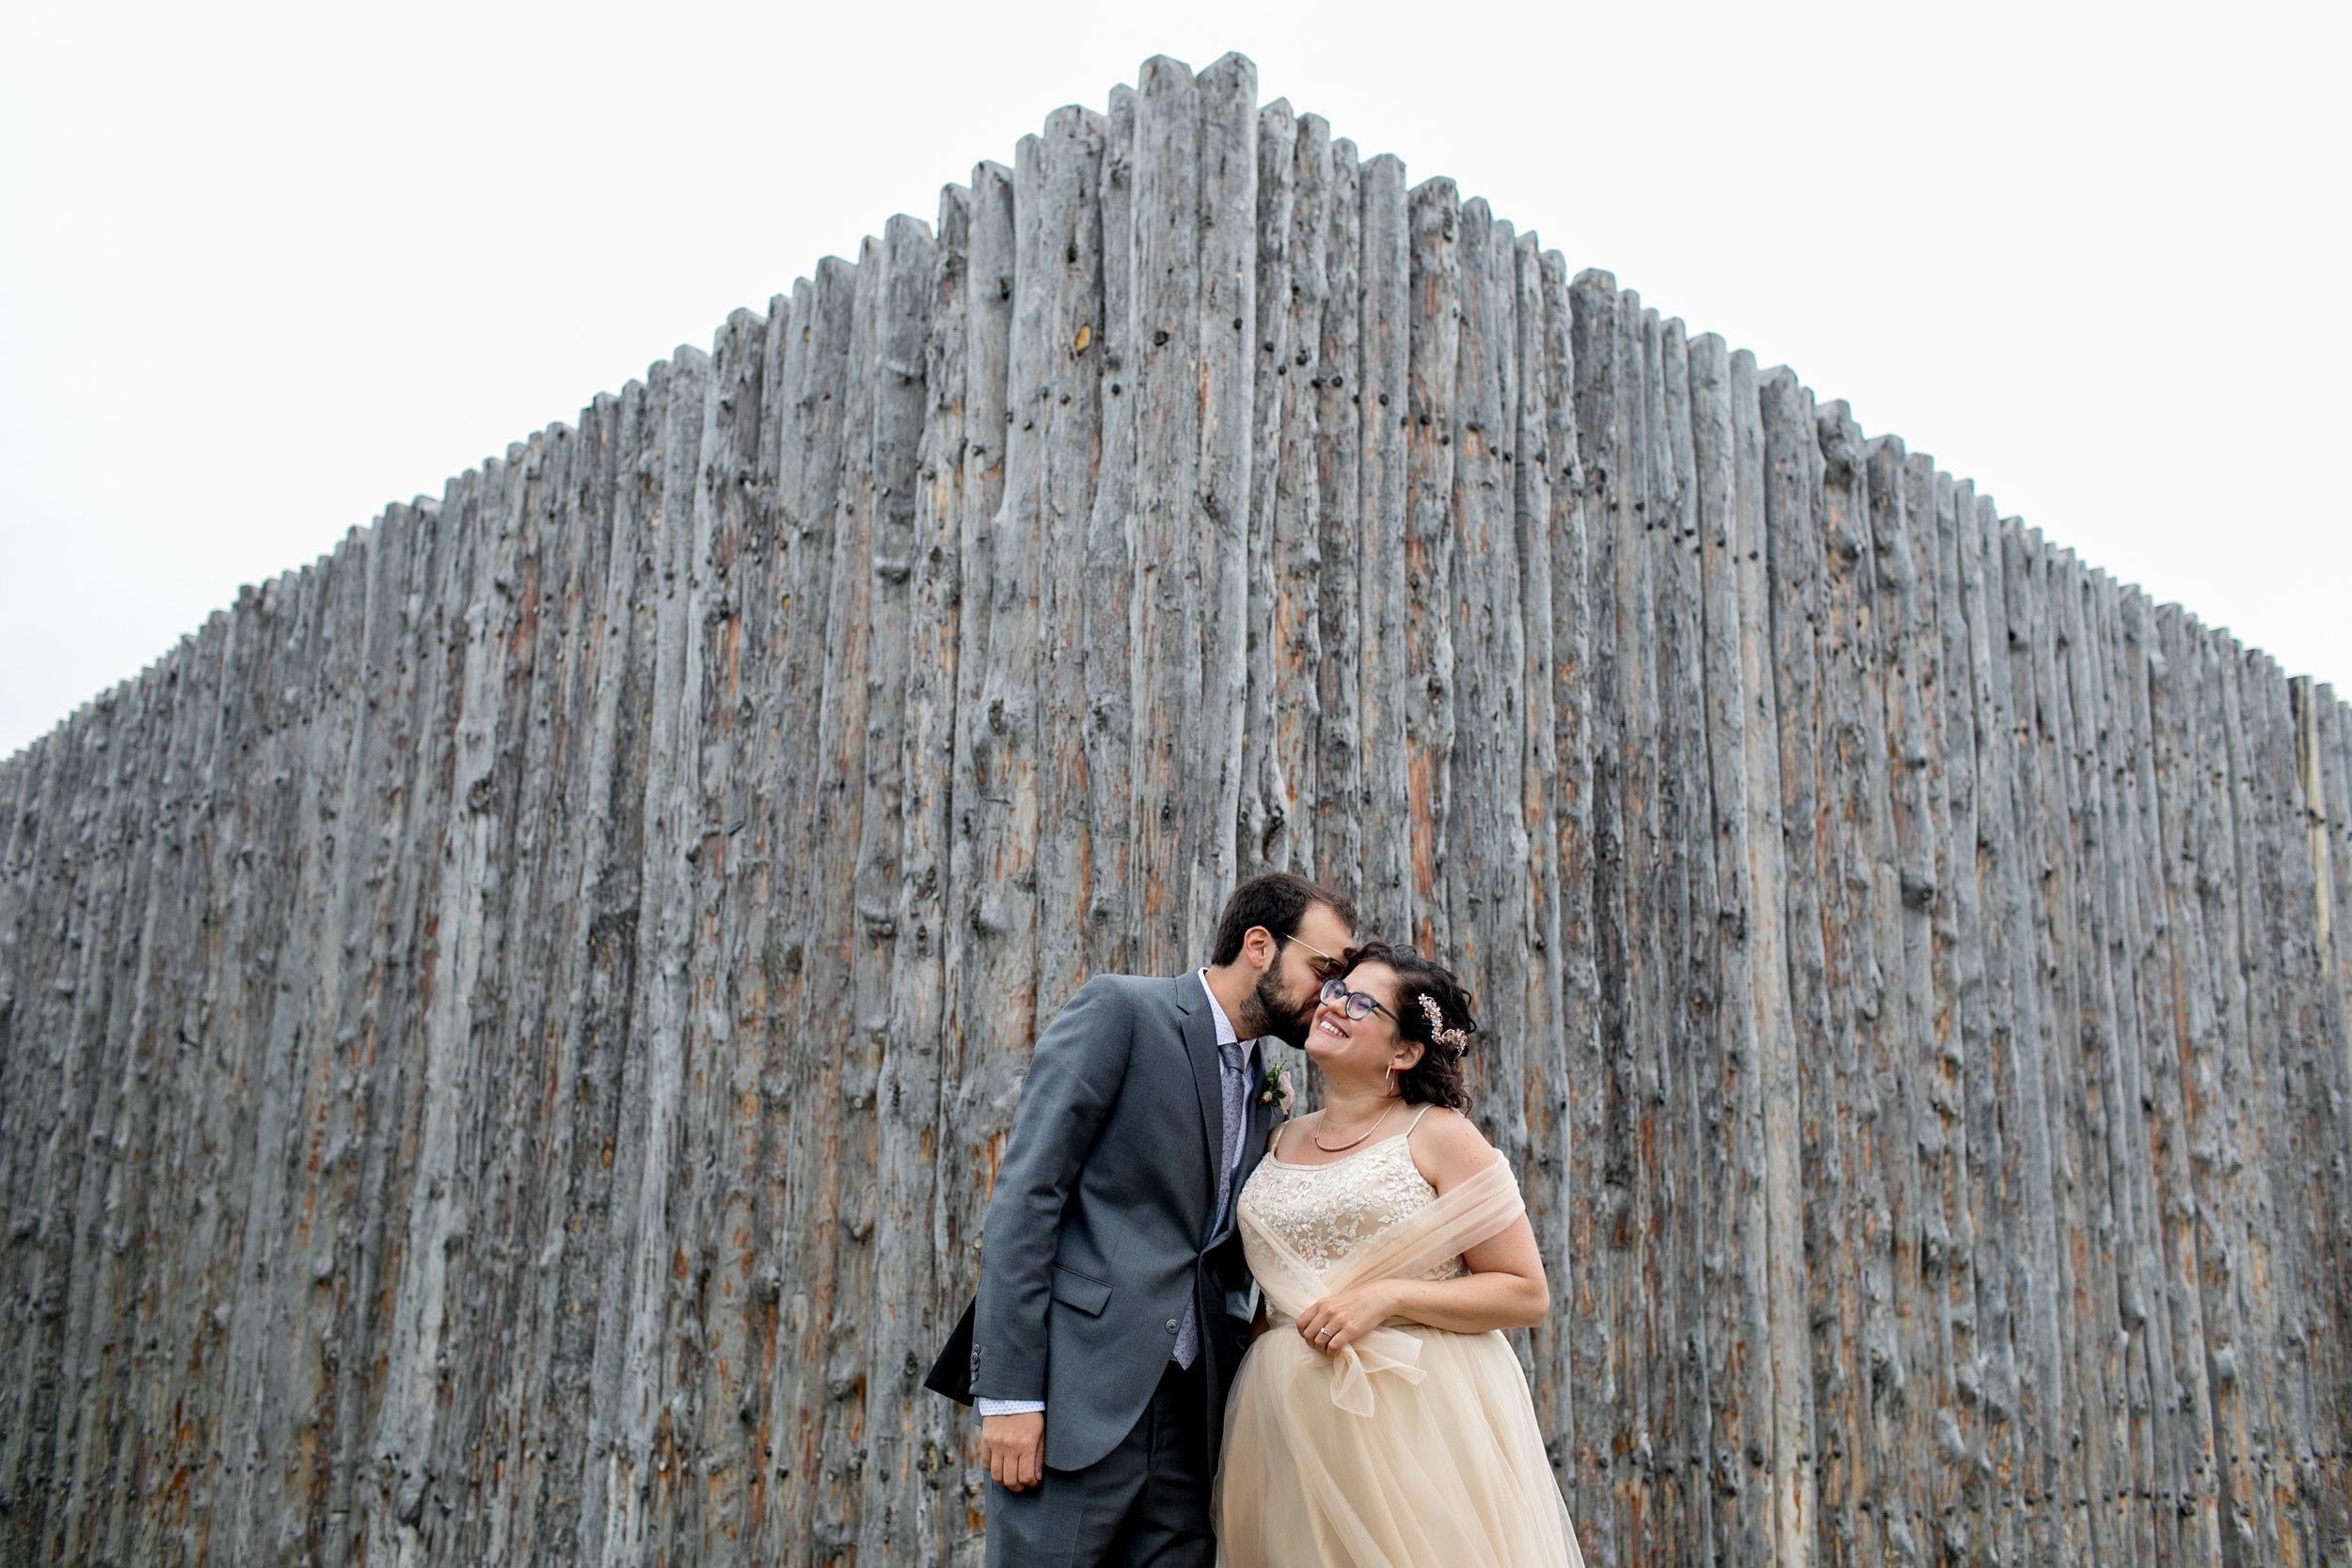 wedding pictures-207.jpg